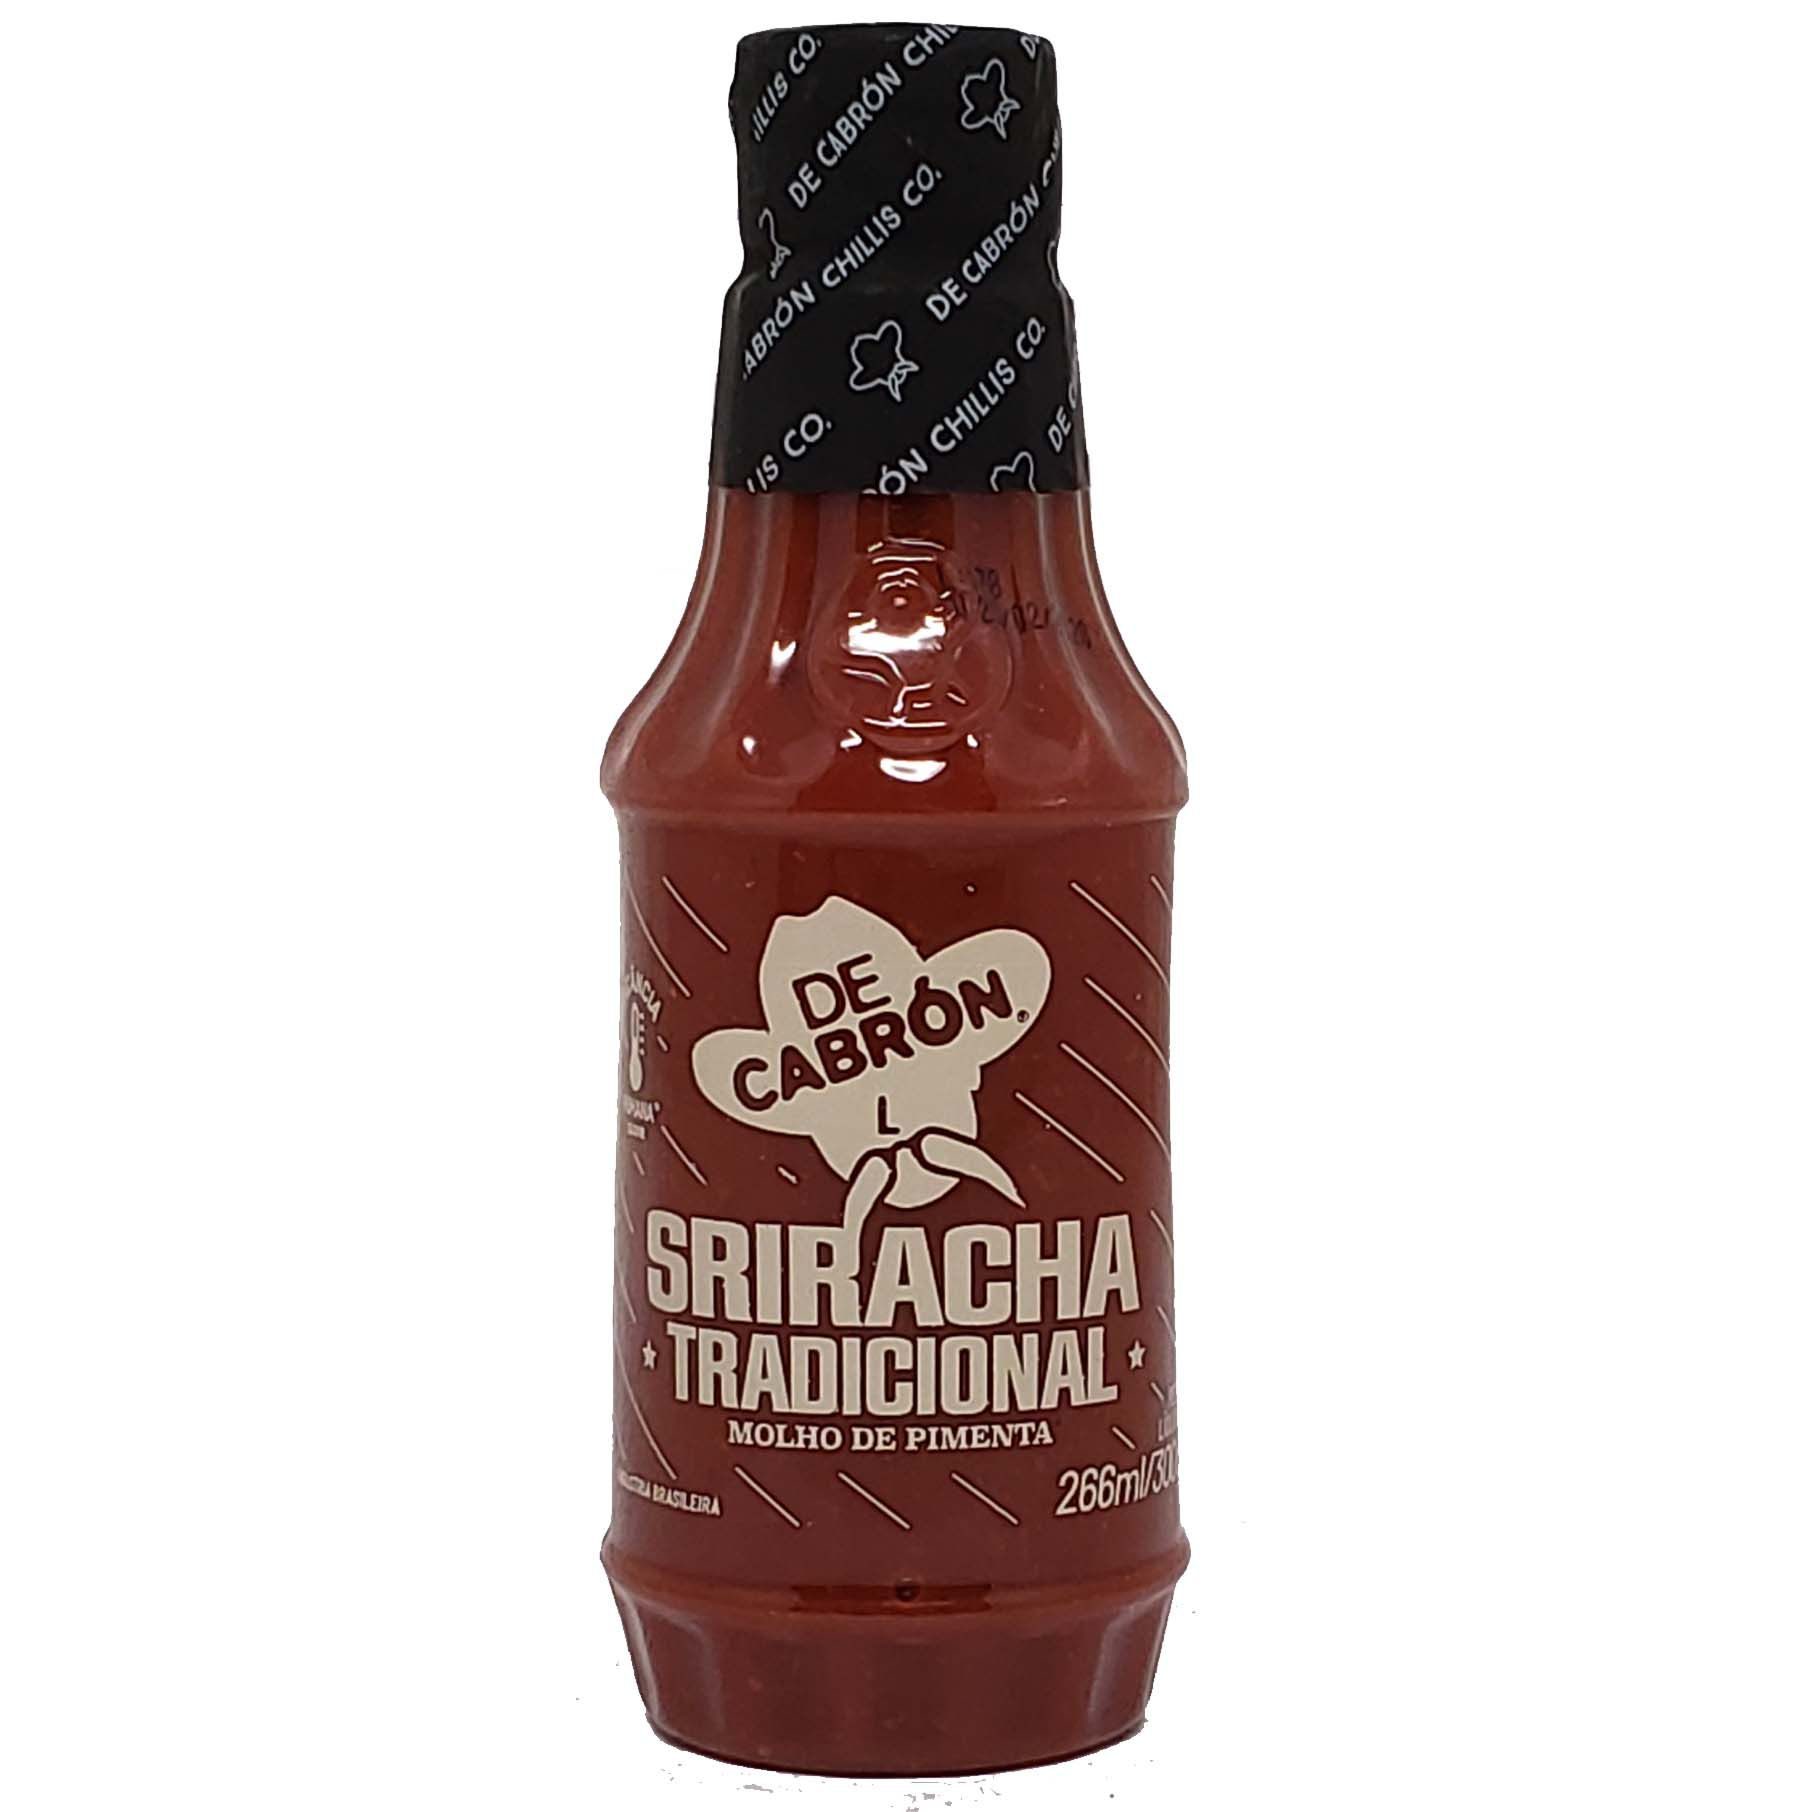 Molho de Pimenta Sriracha Tradicional De Cabrón - 300g -